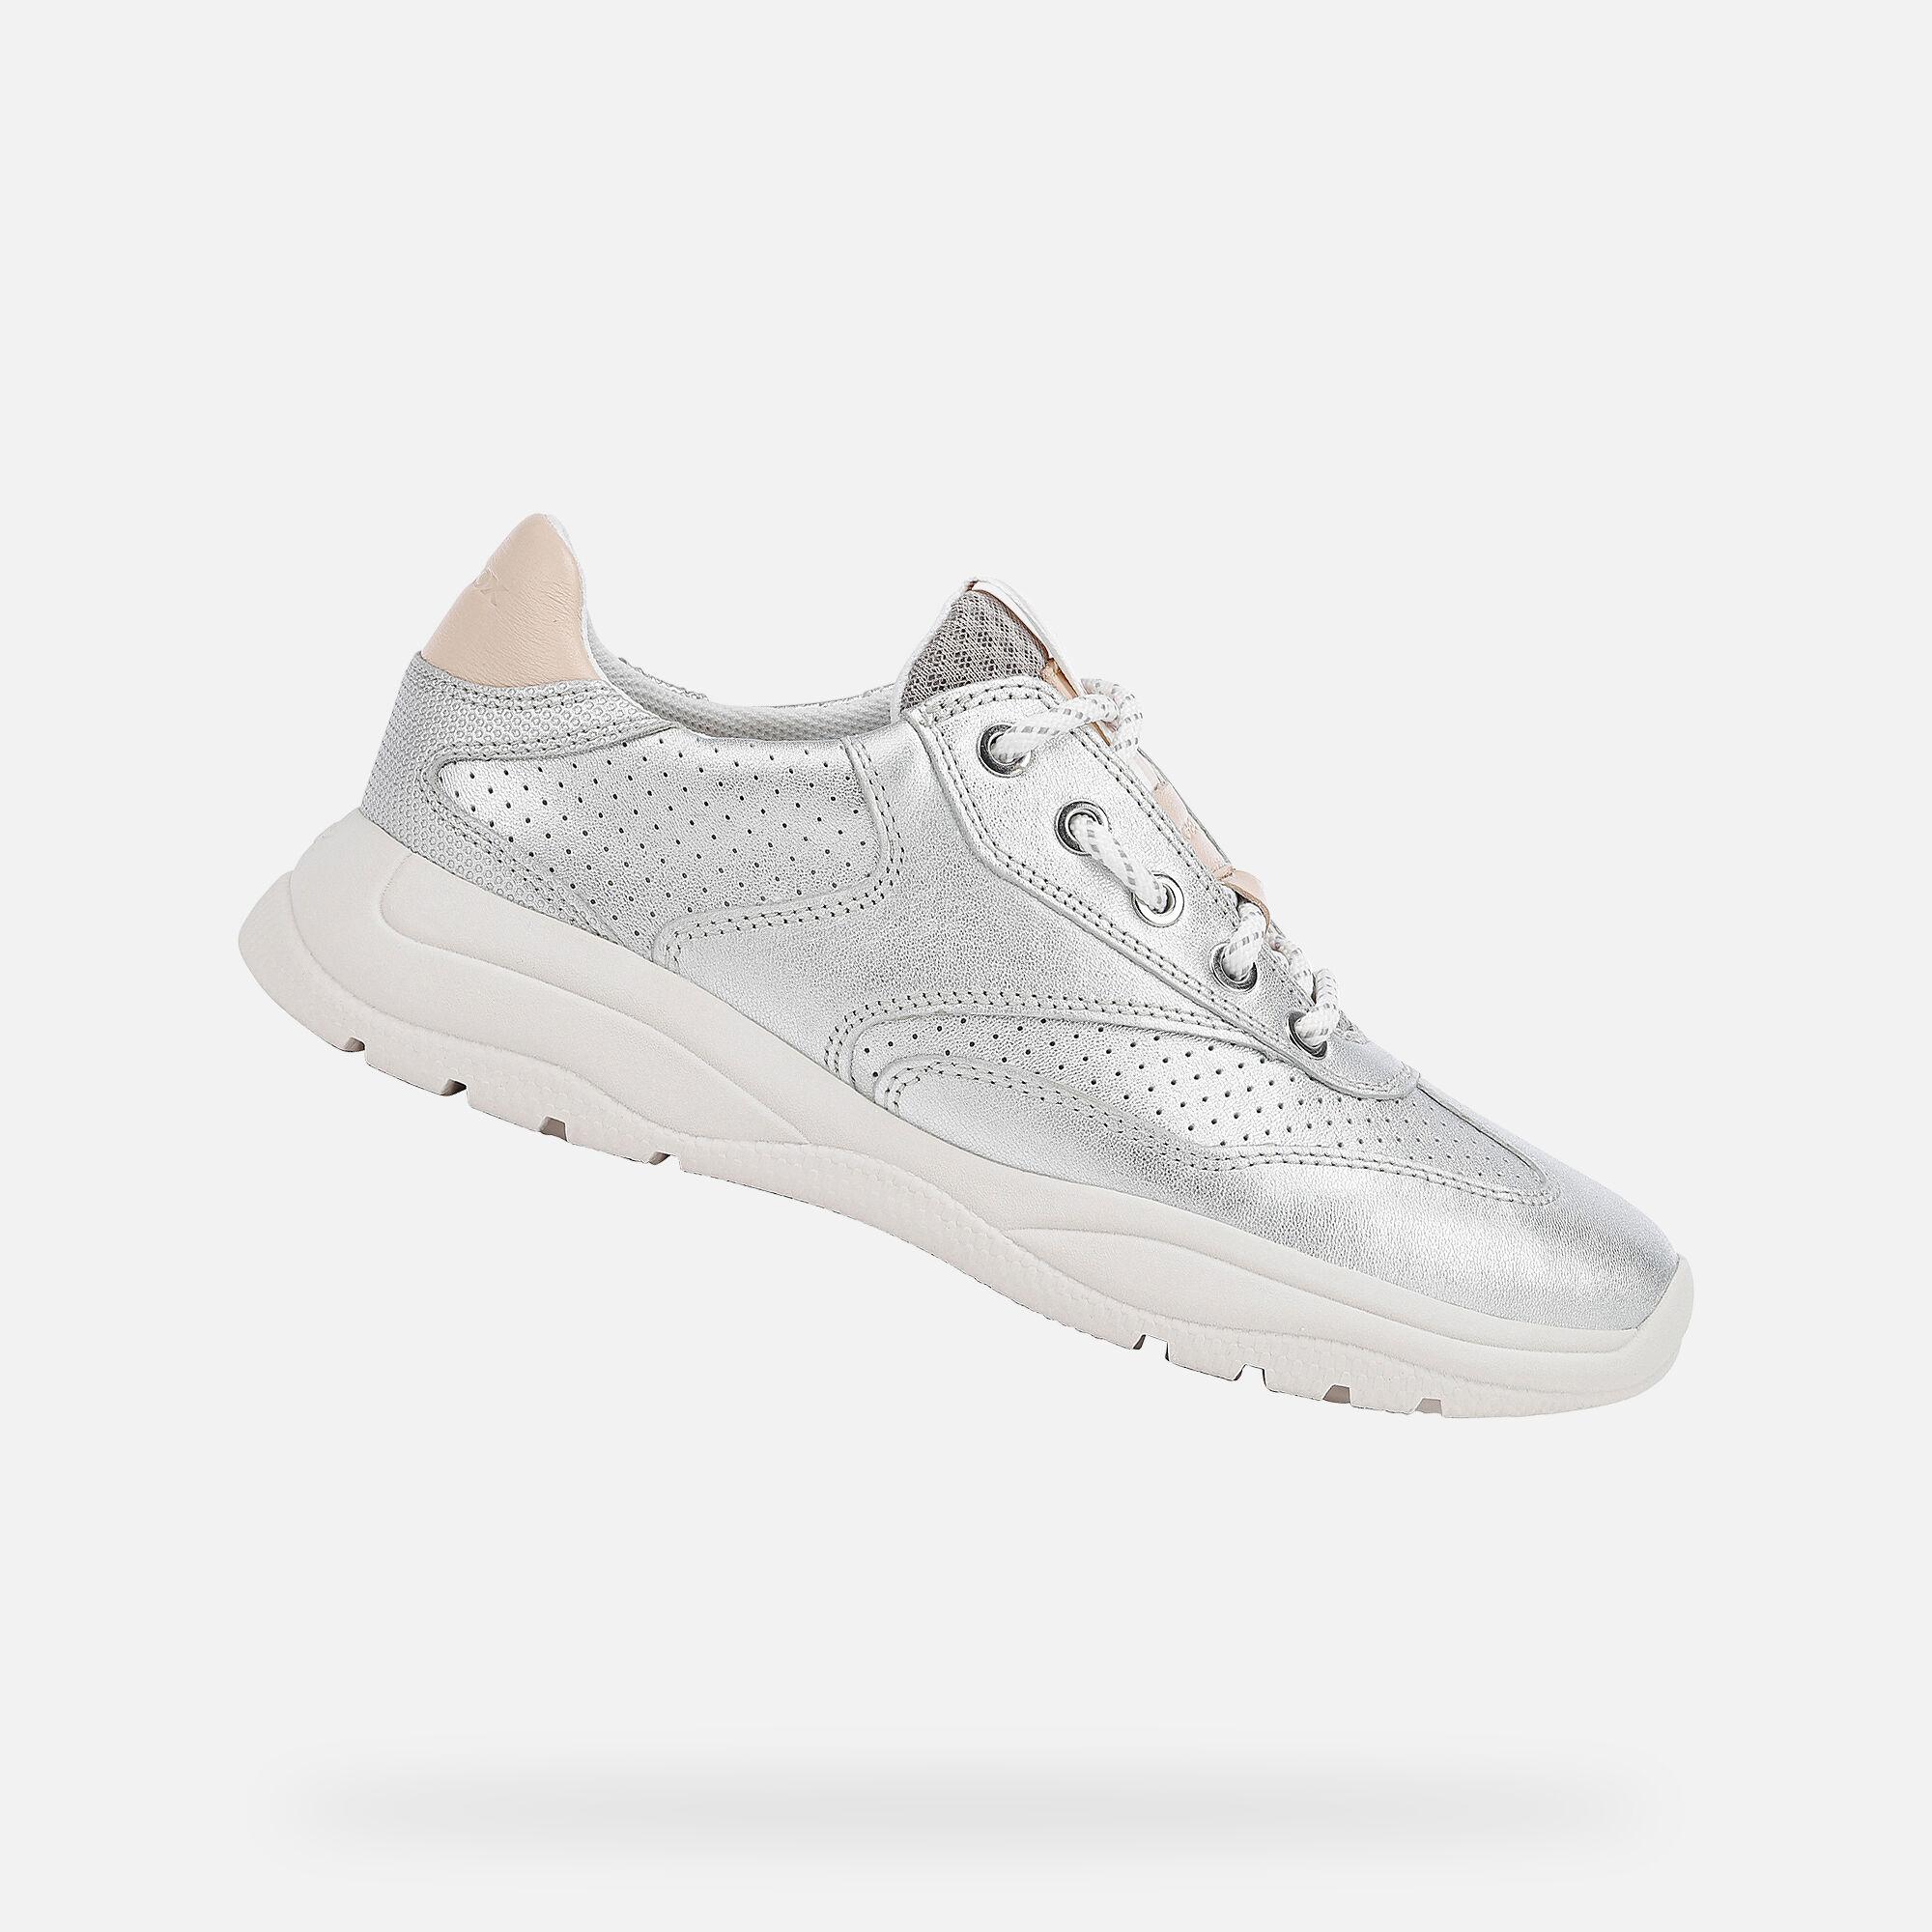 Geox SMERALDO Woman: Silver Sneakers